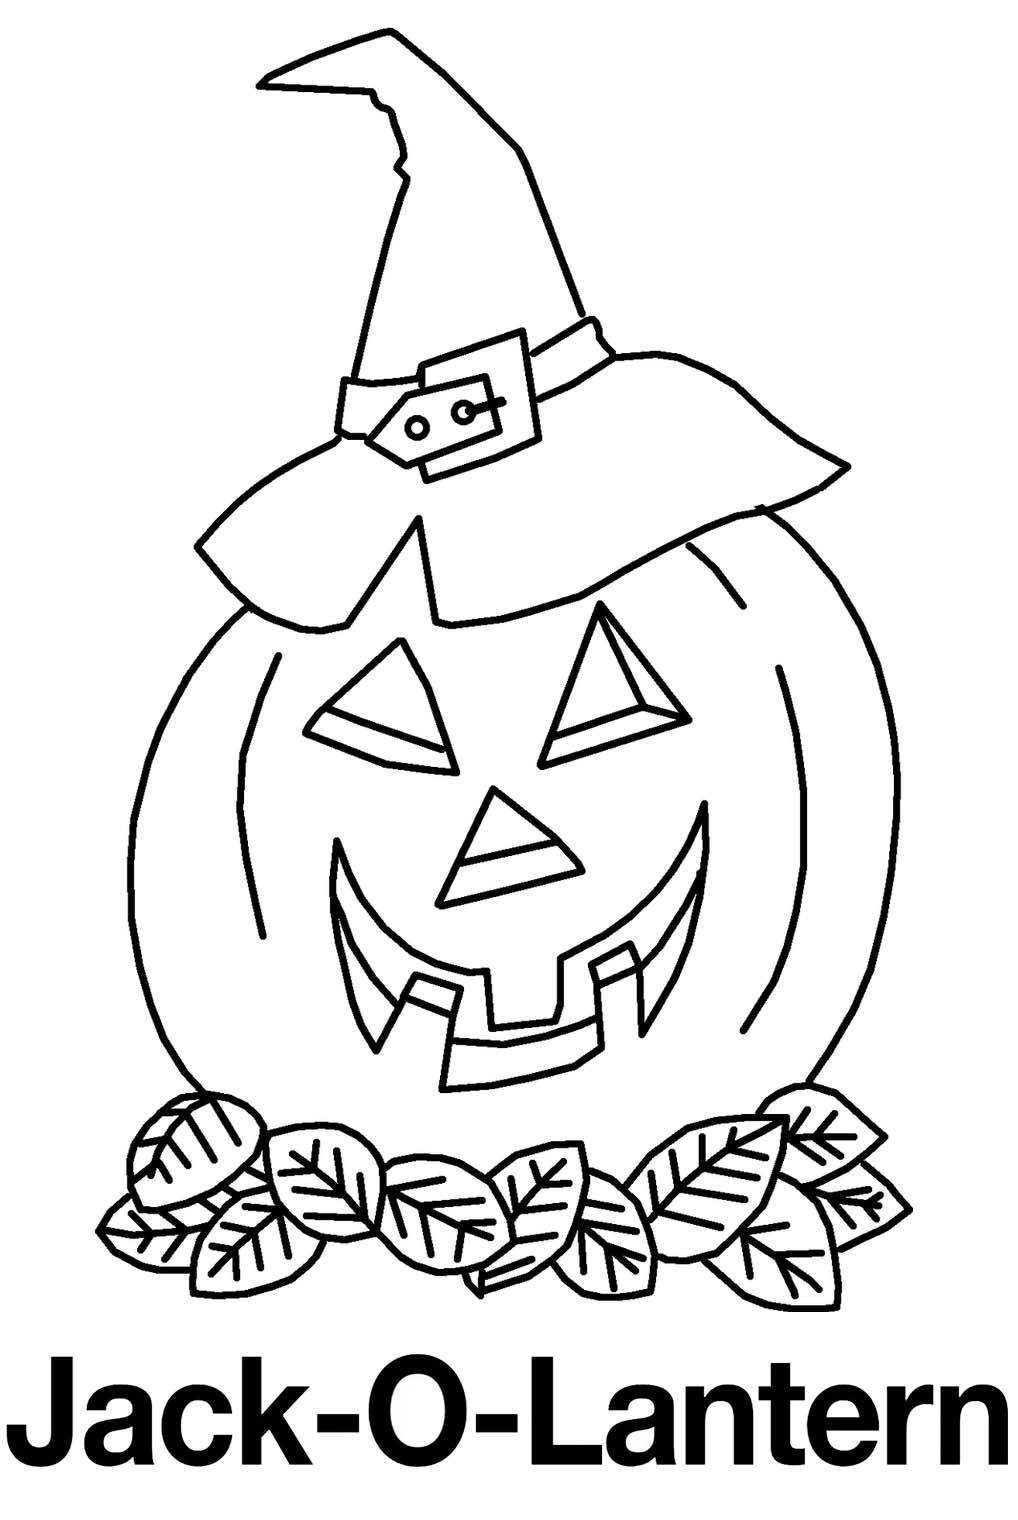 Evil Jack o lantern Coloring Pages